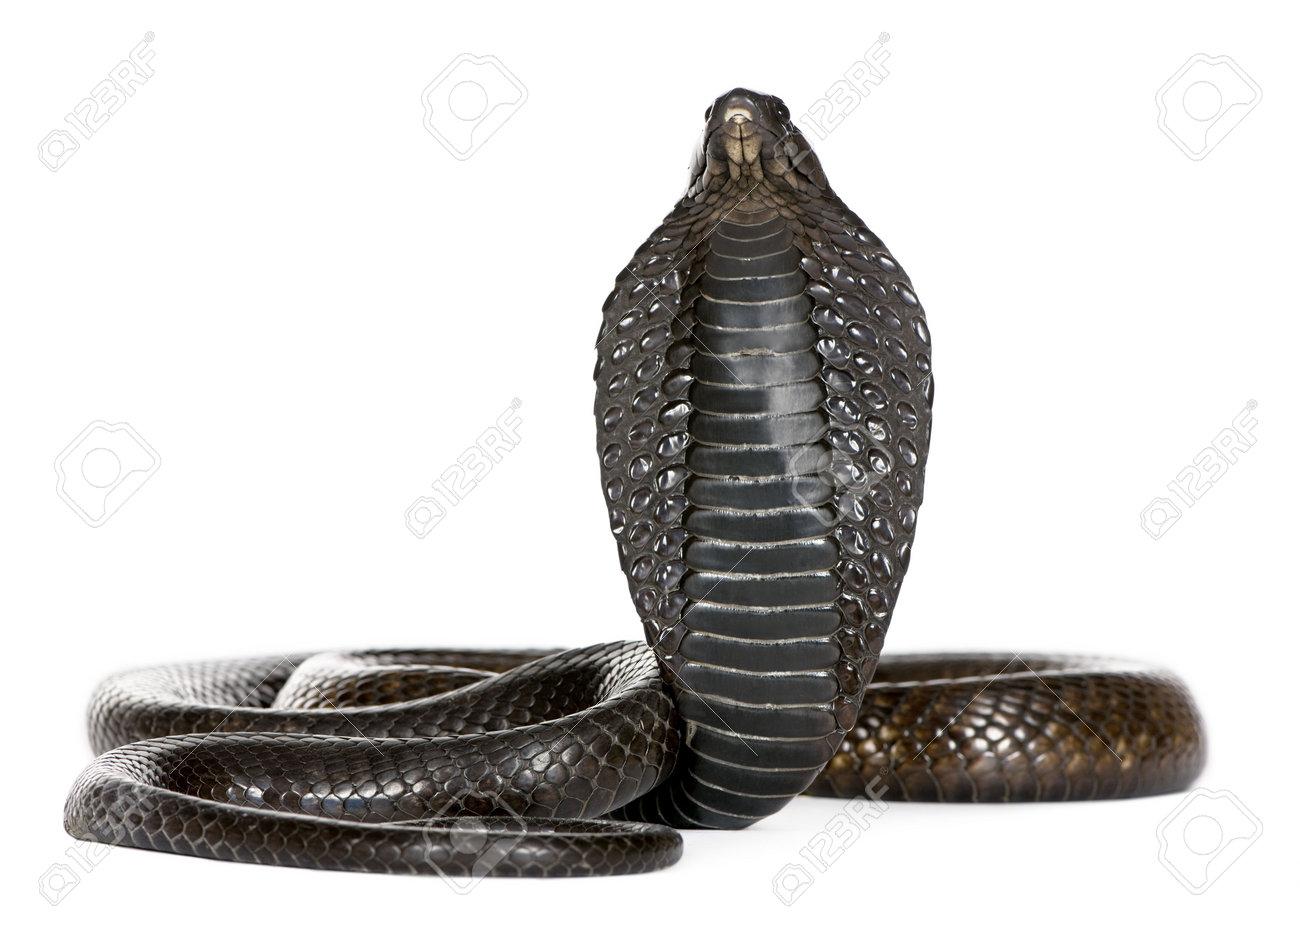 Egyptian Cobra Drawing Egyptian Cobra Naja Haje in